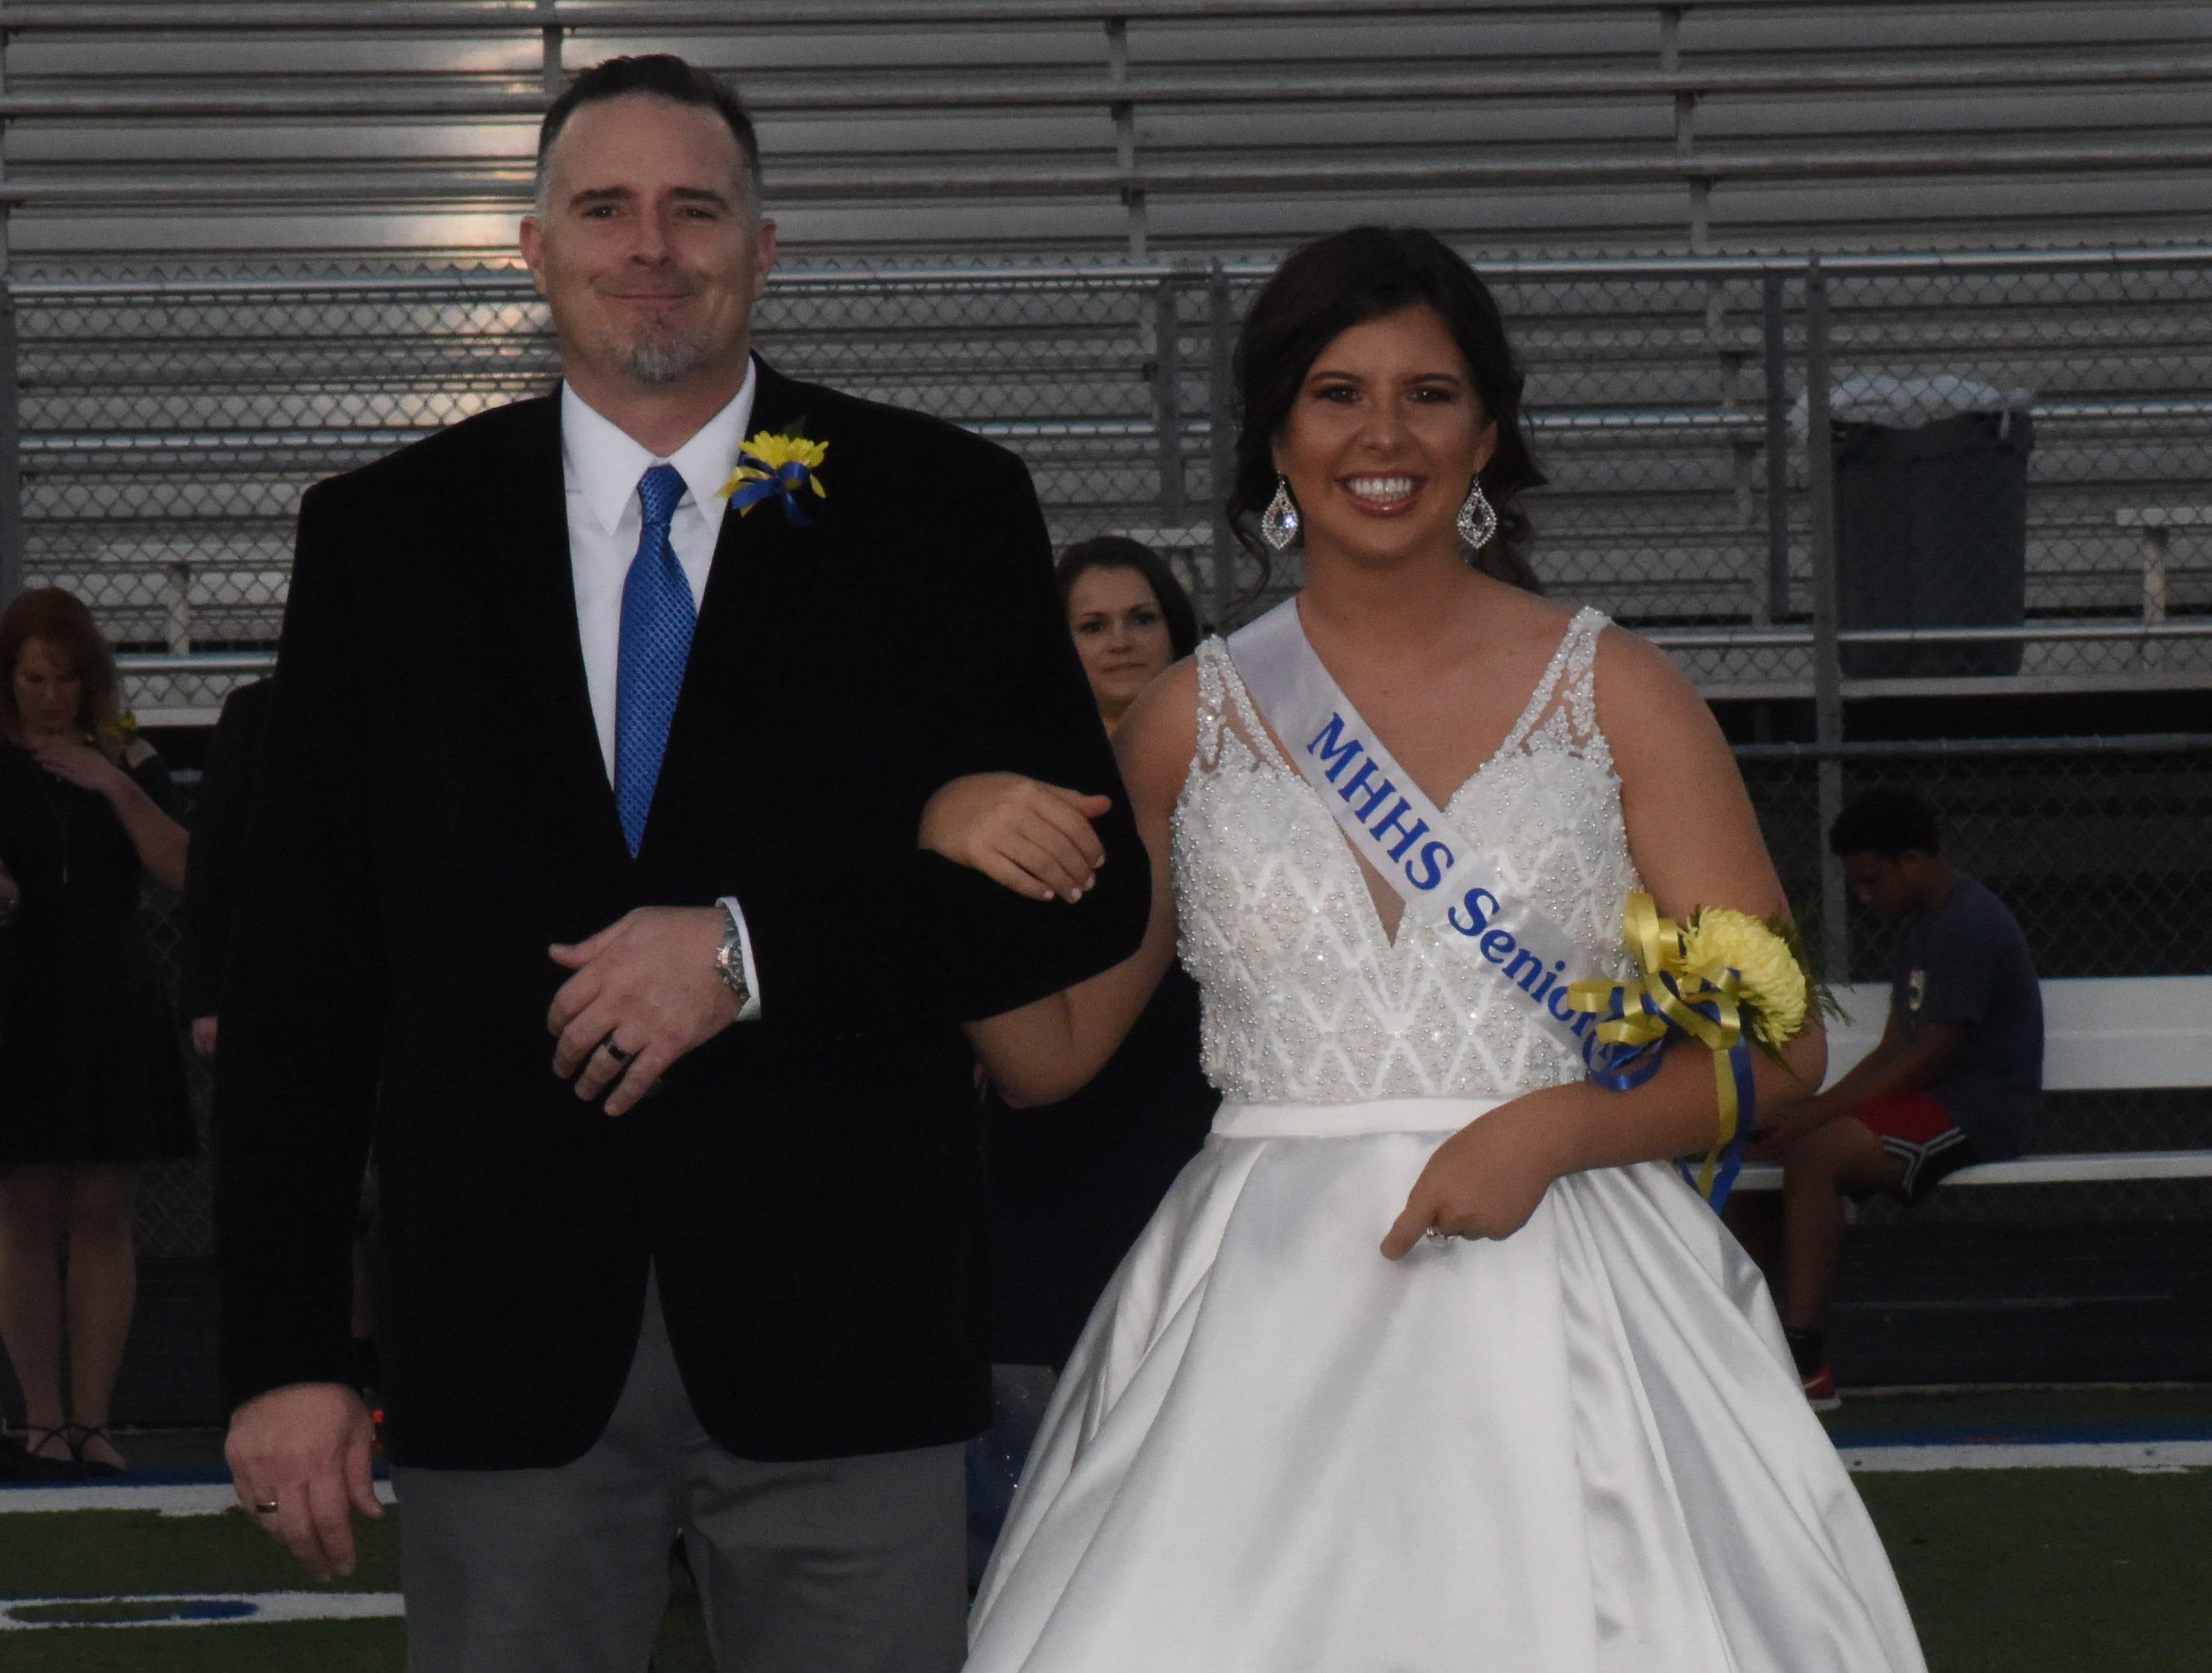 Senior maid Kelsey Pinn and her father, Jody Pinn.